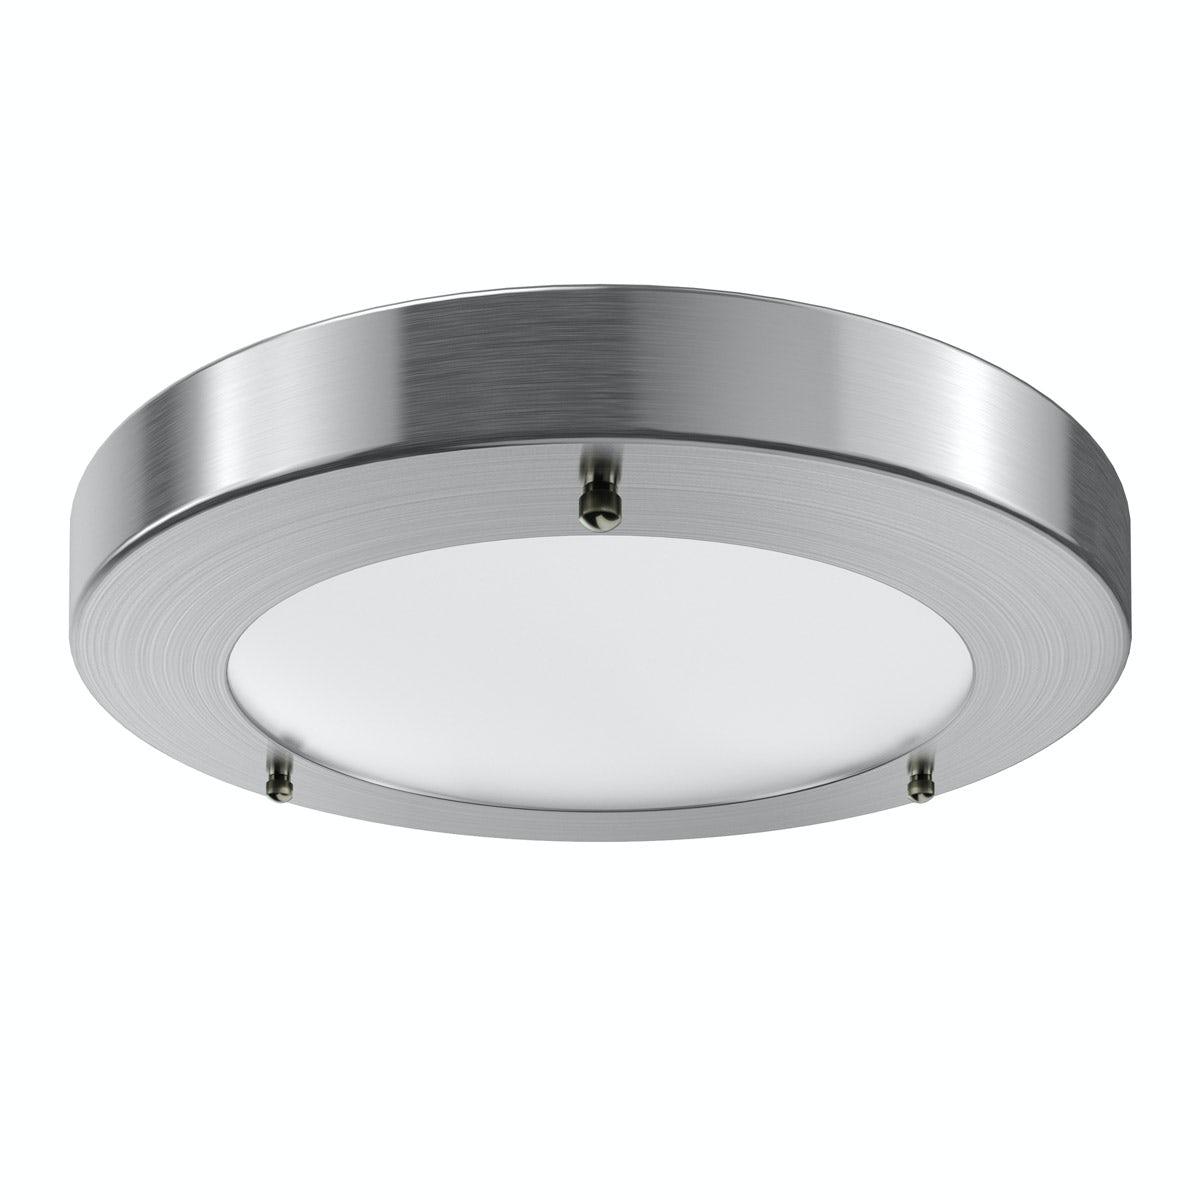 Forum Llum large round flush bathroom ceiling light